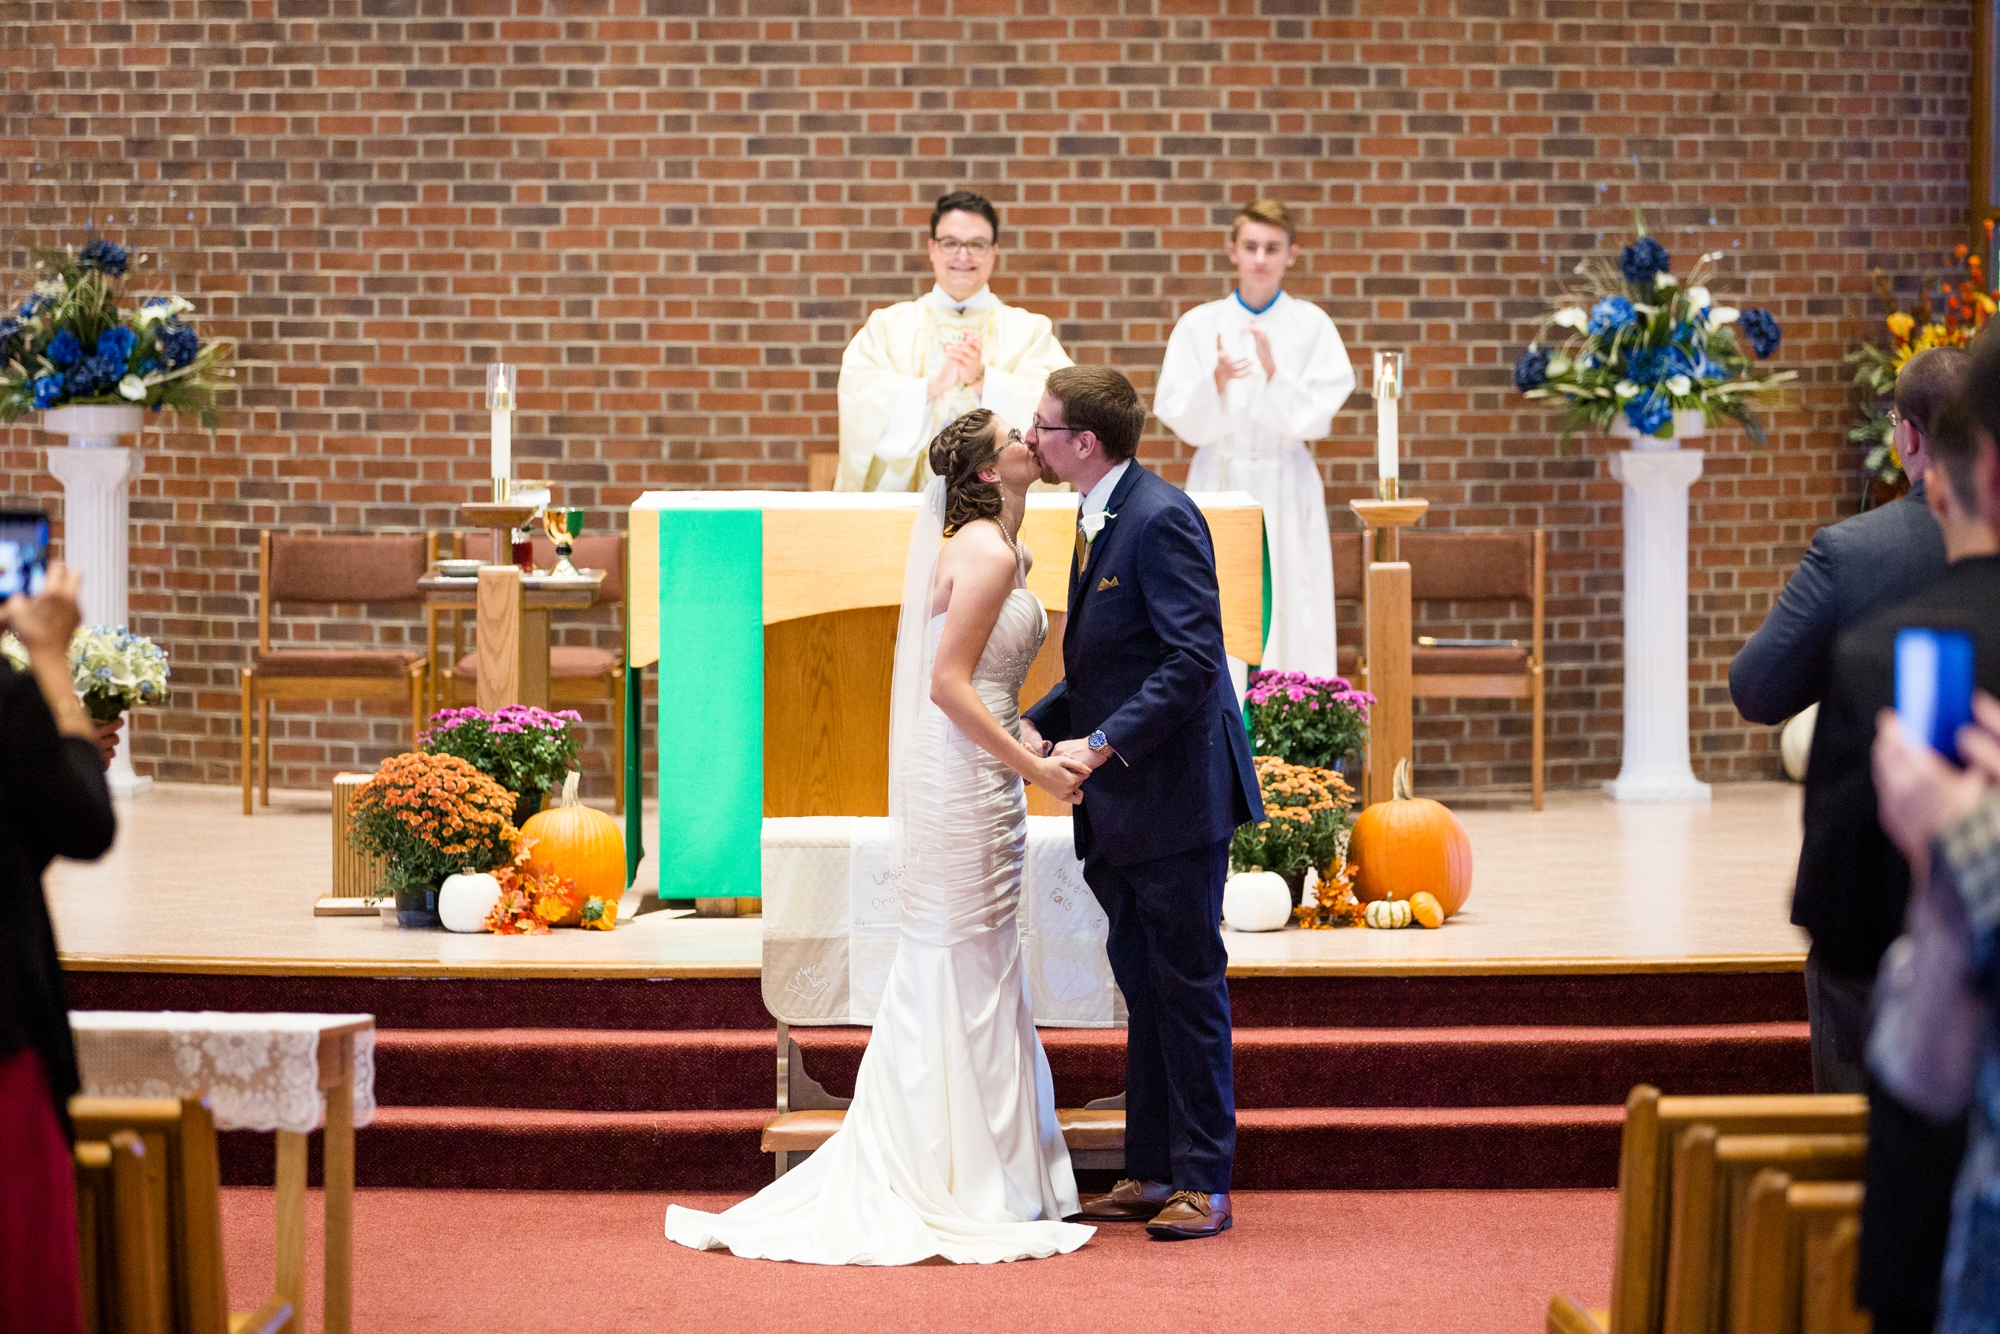 cranberry township wedding photographer, st ferdinand's catholic church photos, camelot banquet hall wedding photos, cranberry township wedding venues